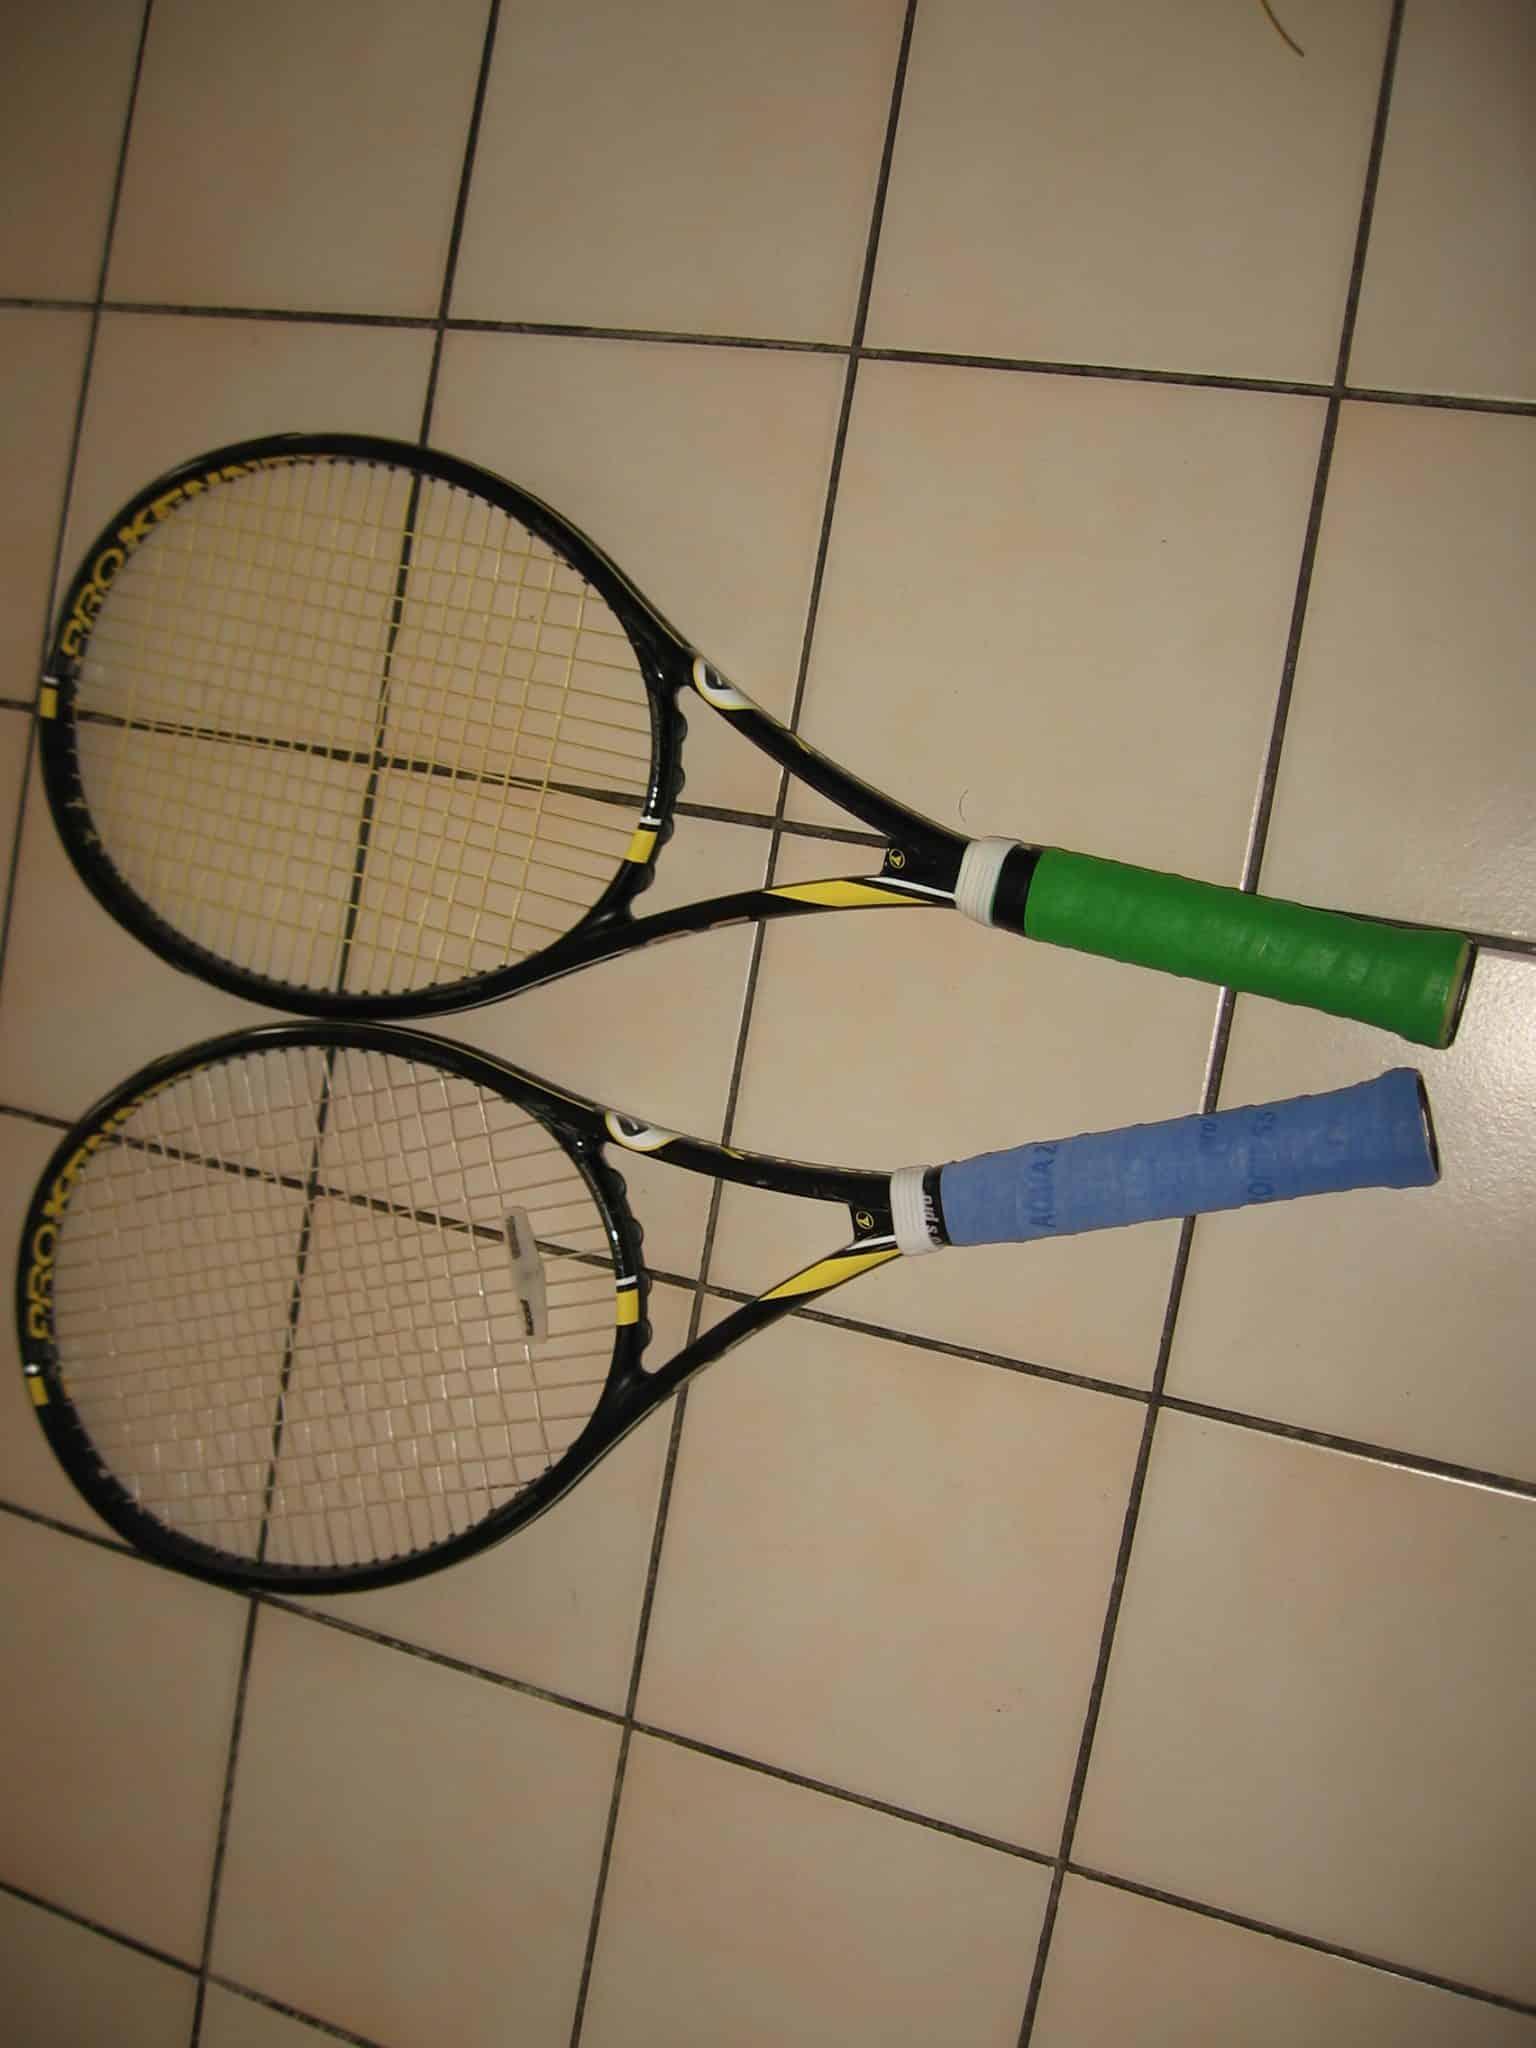 2 raquettes Pro Kennex Ki Q+5 290 grs  manche 3